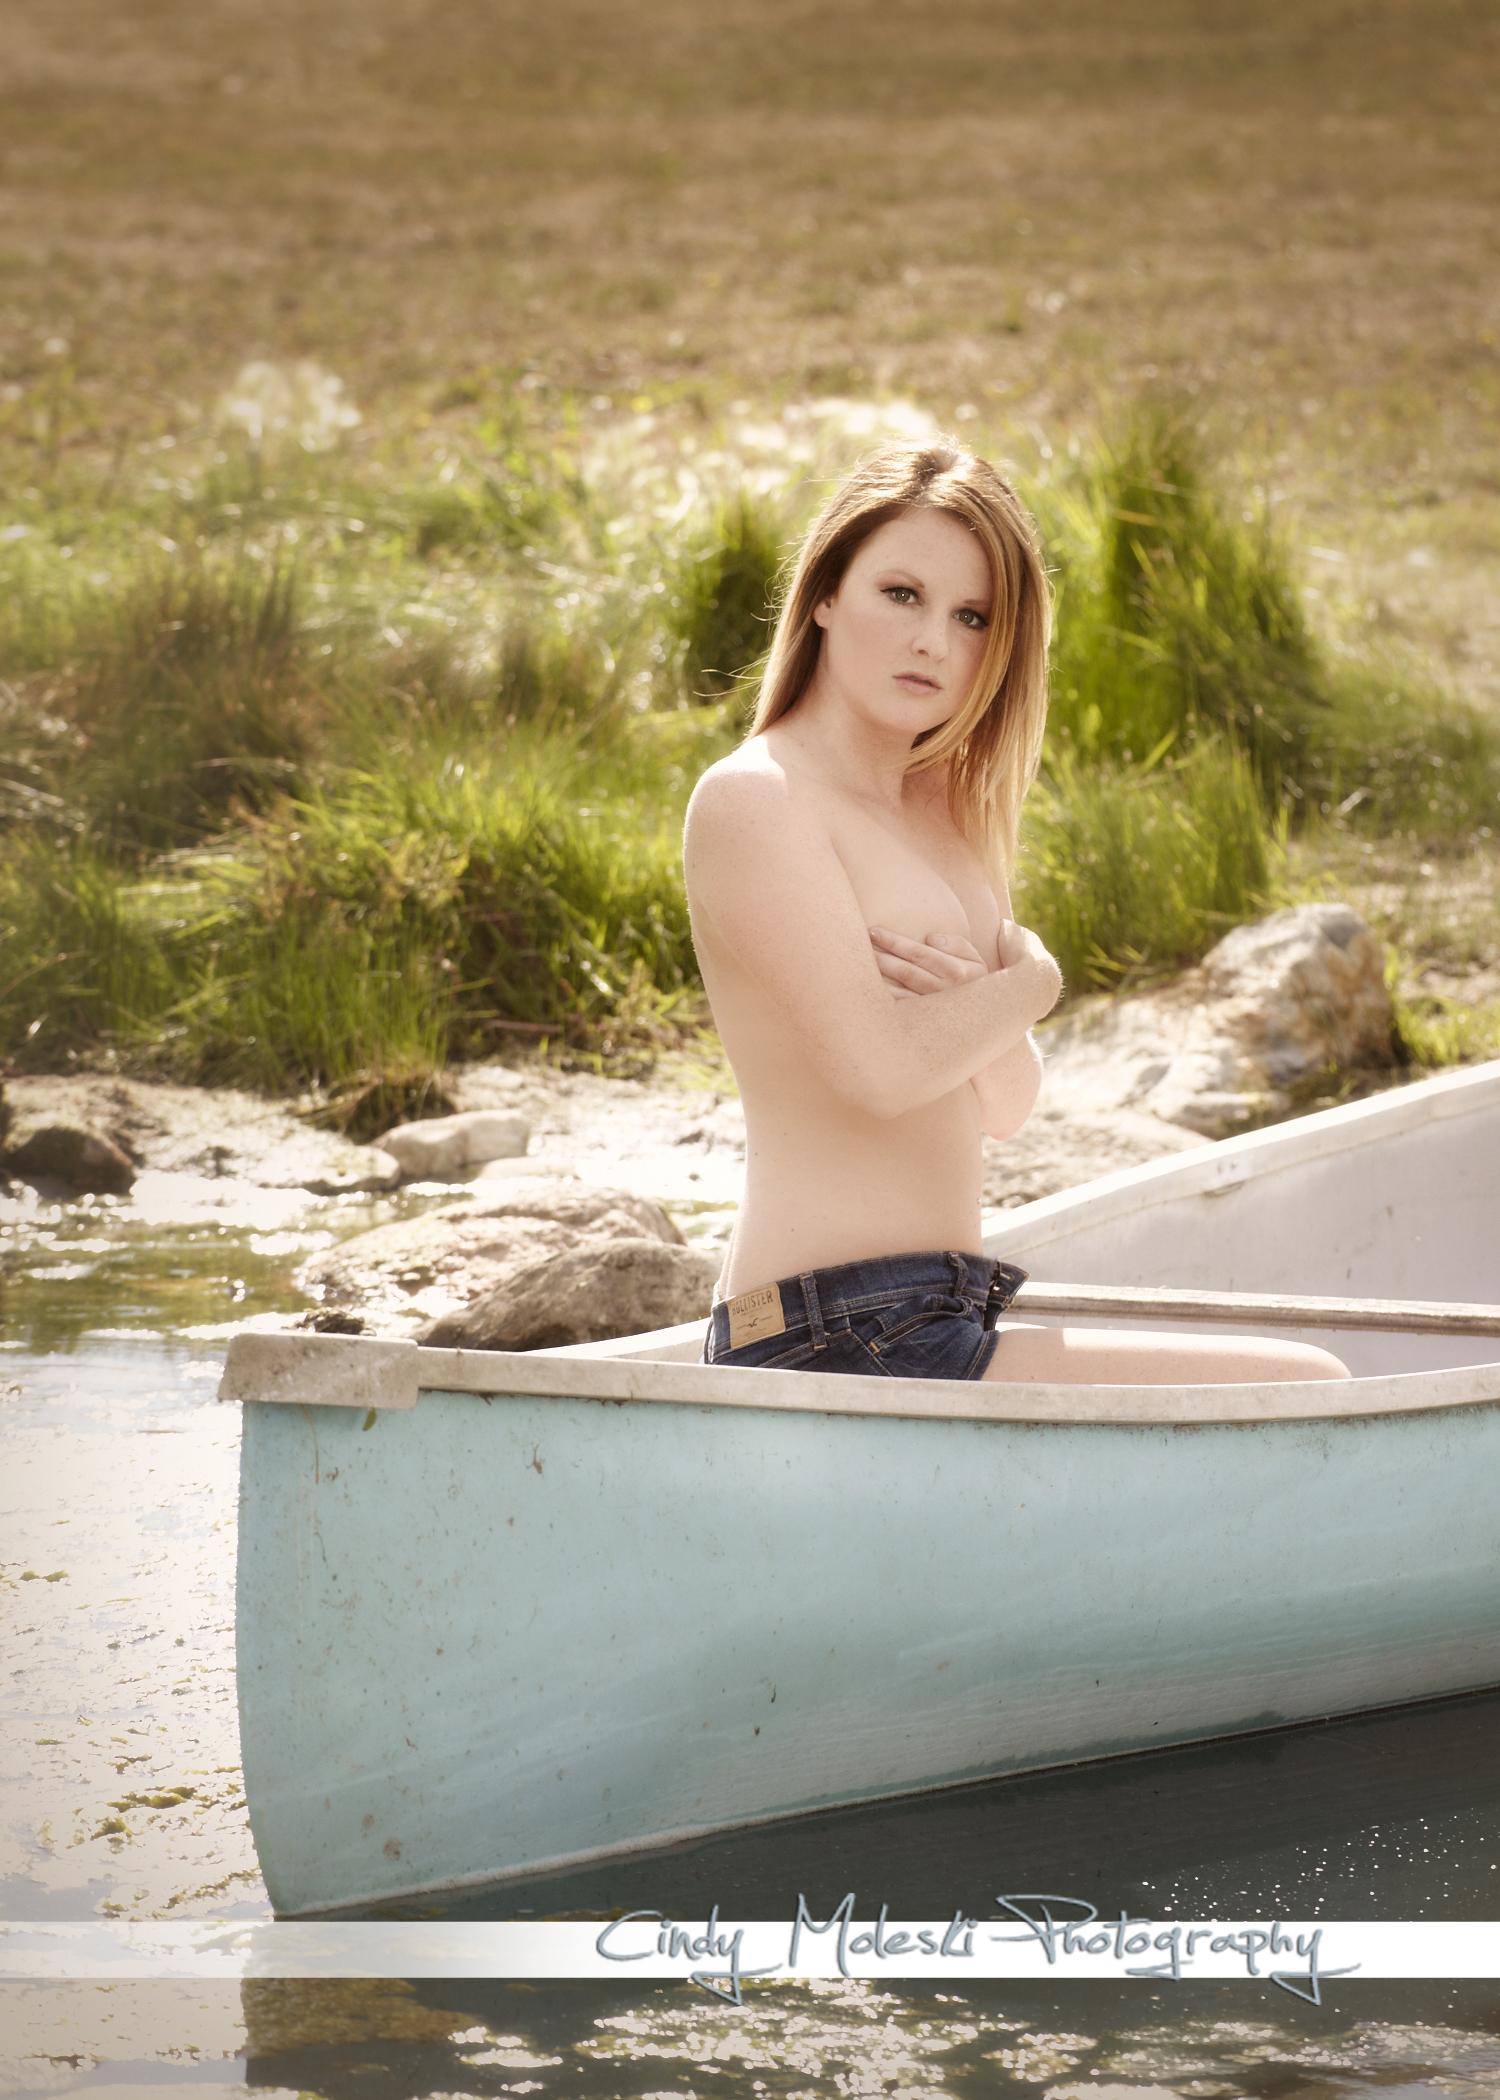 professional-boudoir-photographer-cindy-moleski-Pulver10C9548blog).jpg